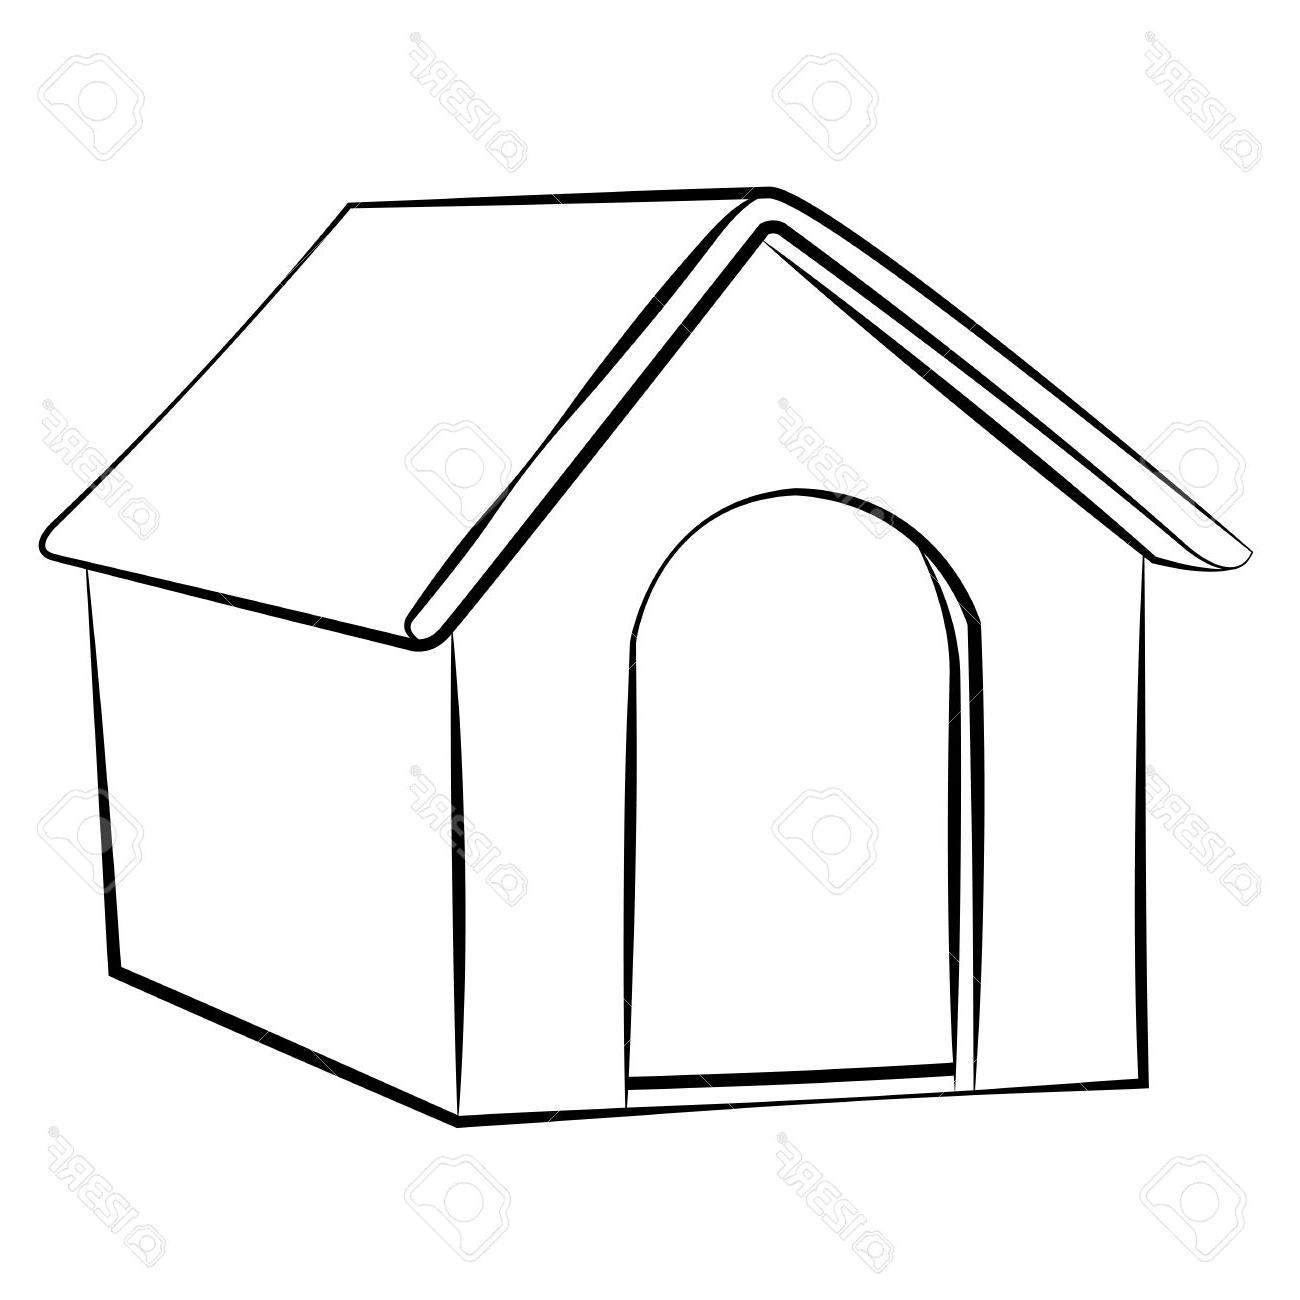 1300x1300 Best Outline Sketch Dog House Vector Illustration Stock White Image